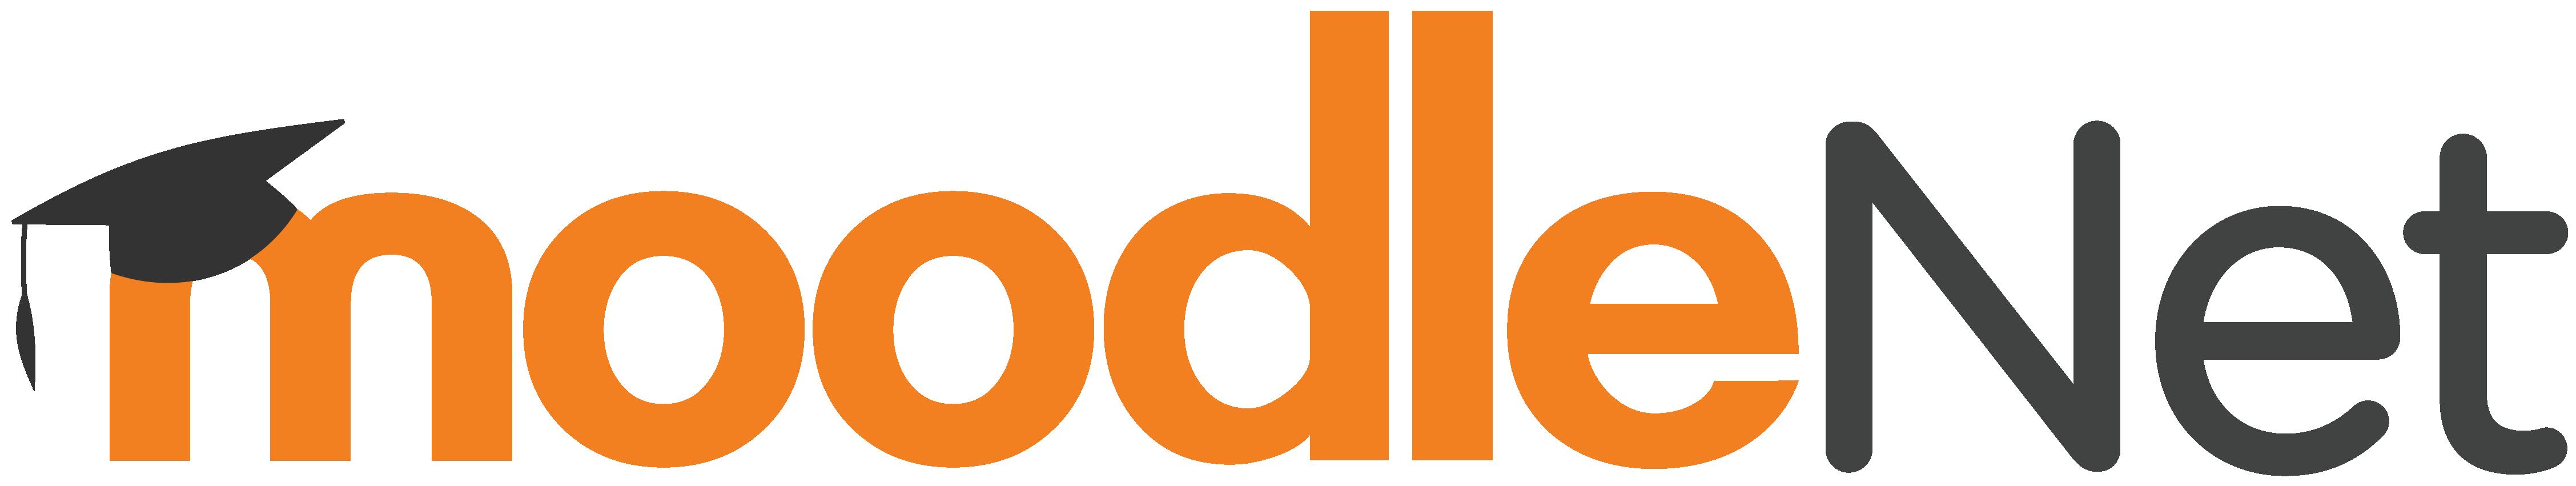 MoodleNet logo